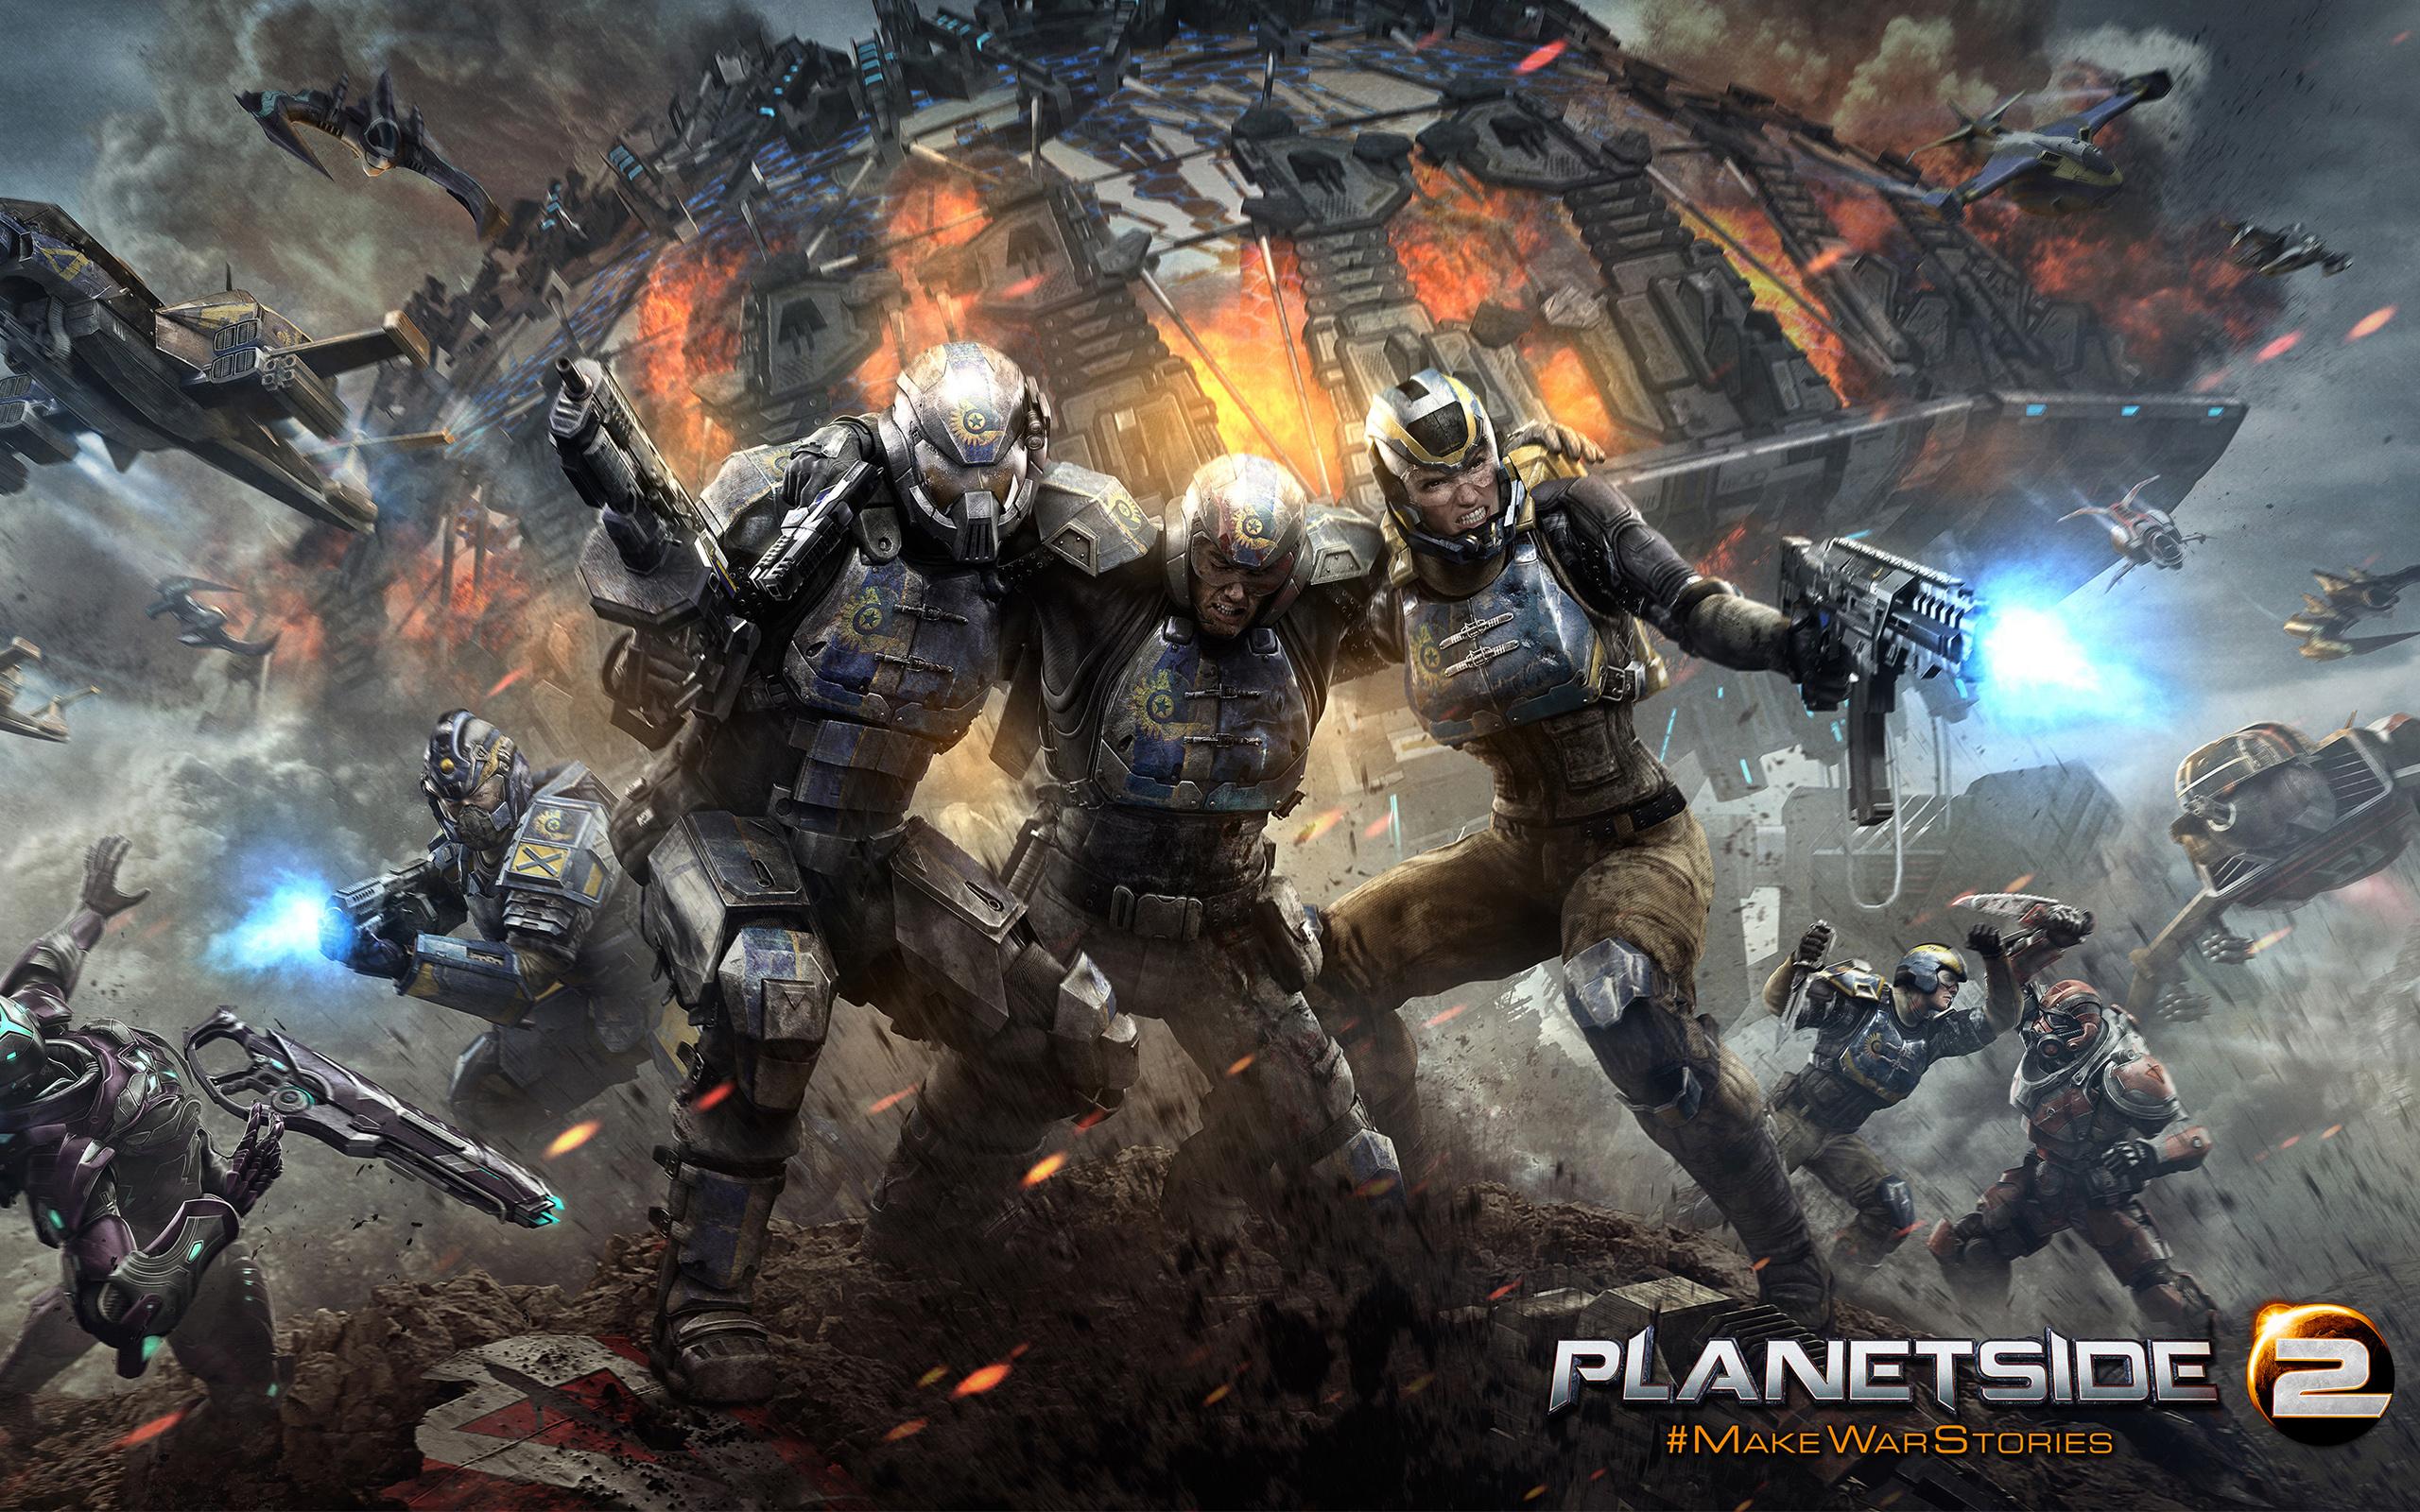 Planetside 2 HD Wallpaper Background Image 2560x1600 ID 2560x1600